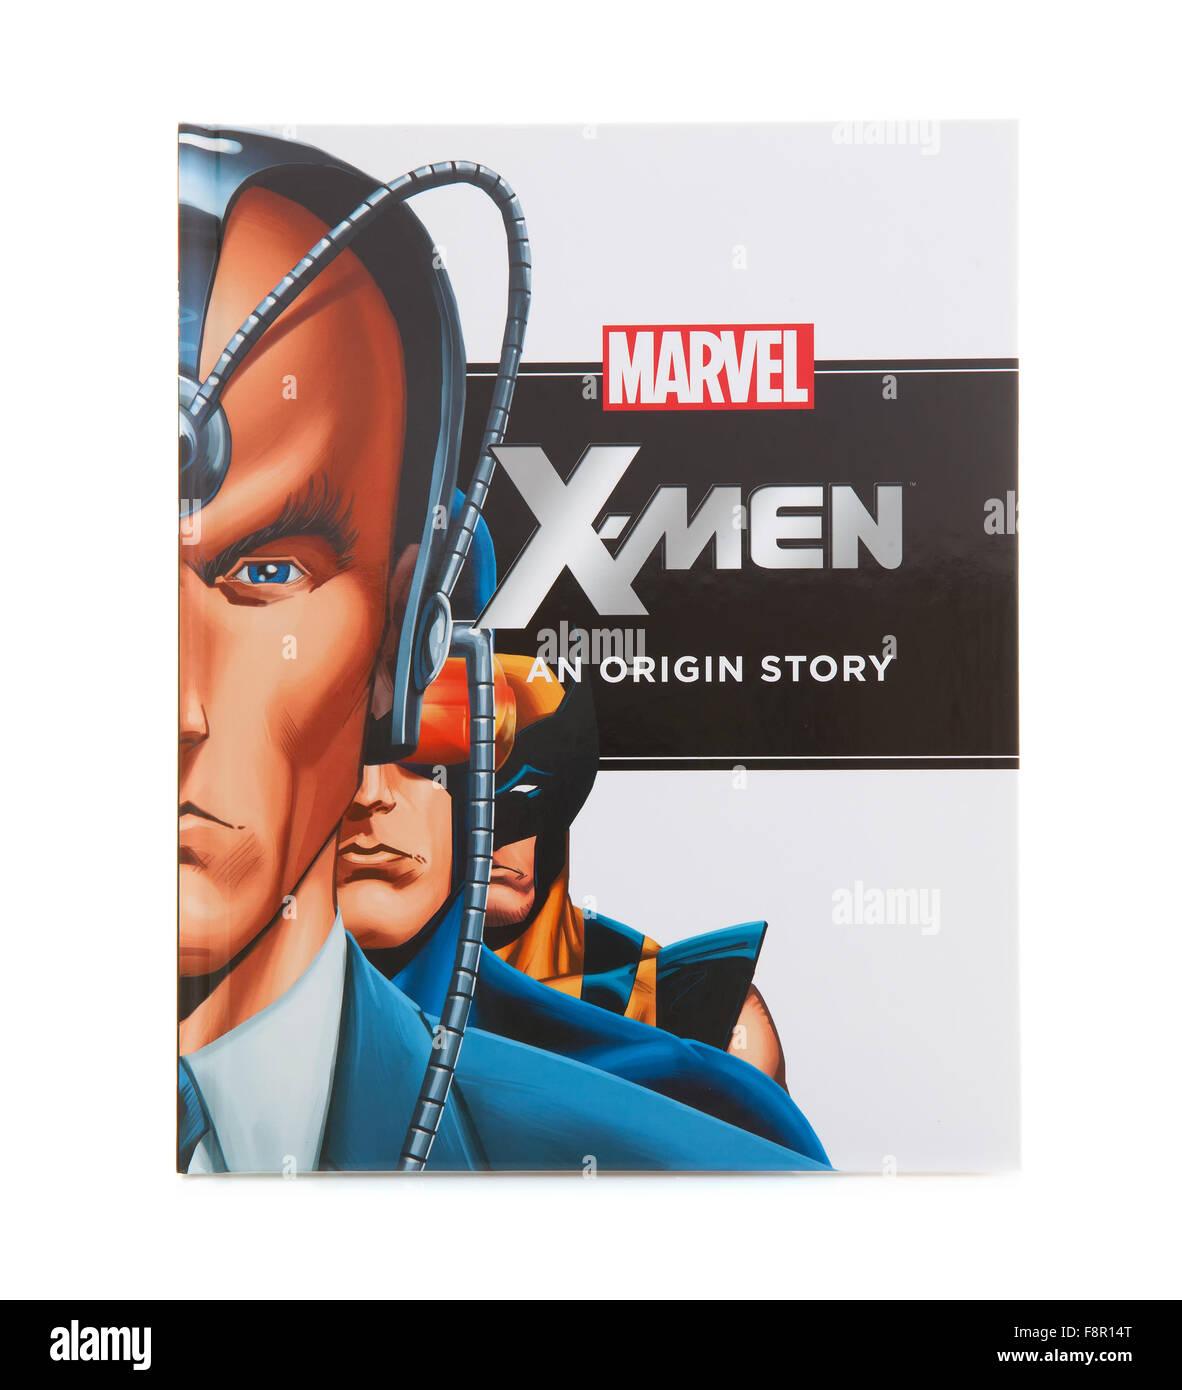 MARVEL Book X-MEN an Origin Super Hero Story on a White Background - Stock Image